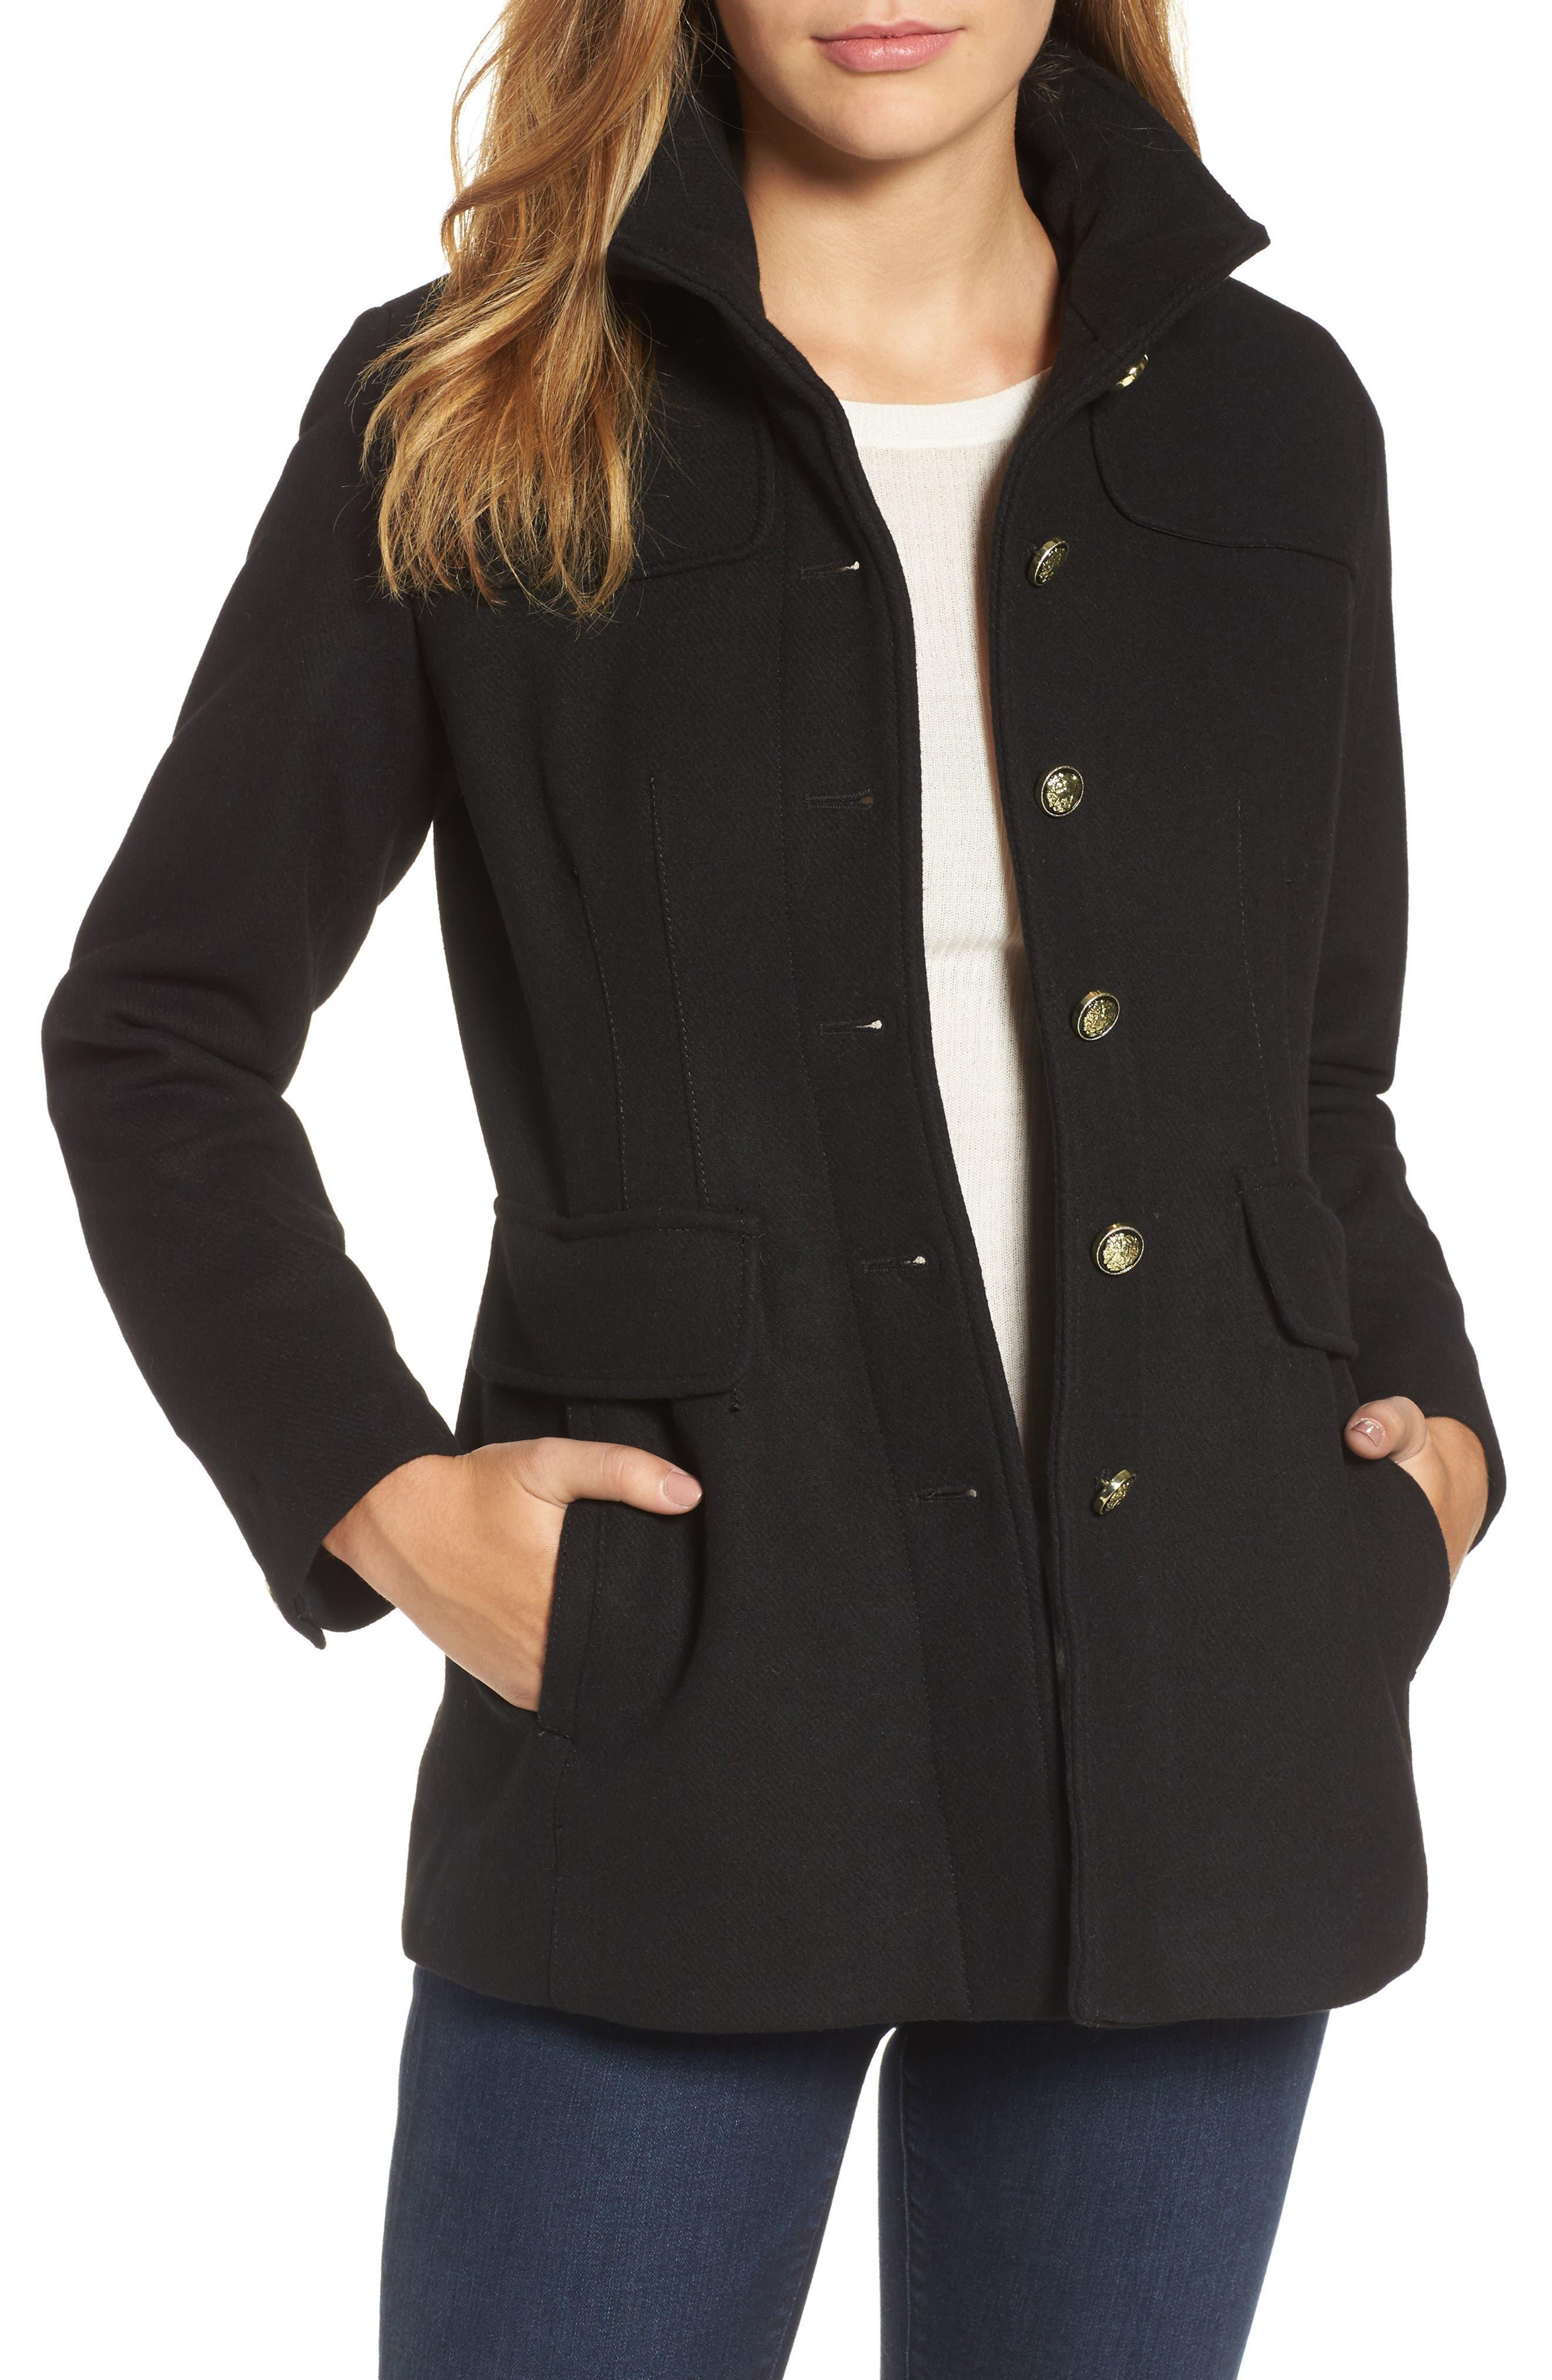 Main Image - Vince Camuto Wool Blend Coat